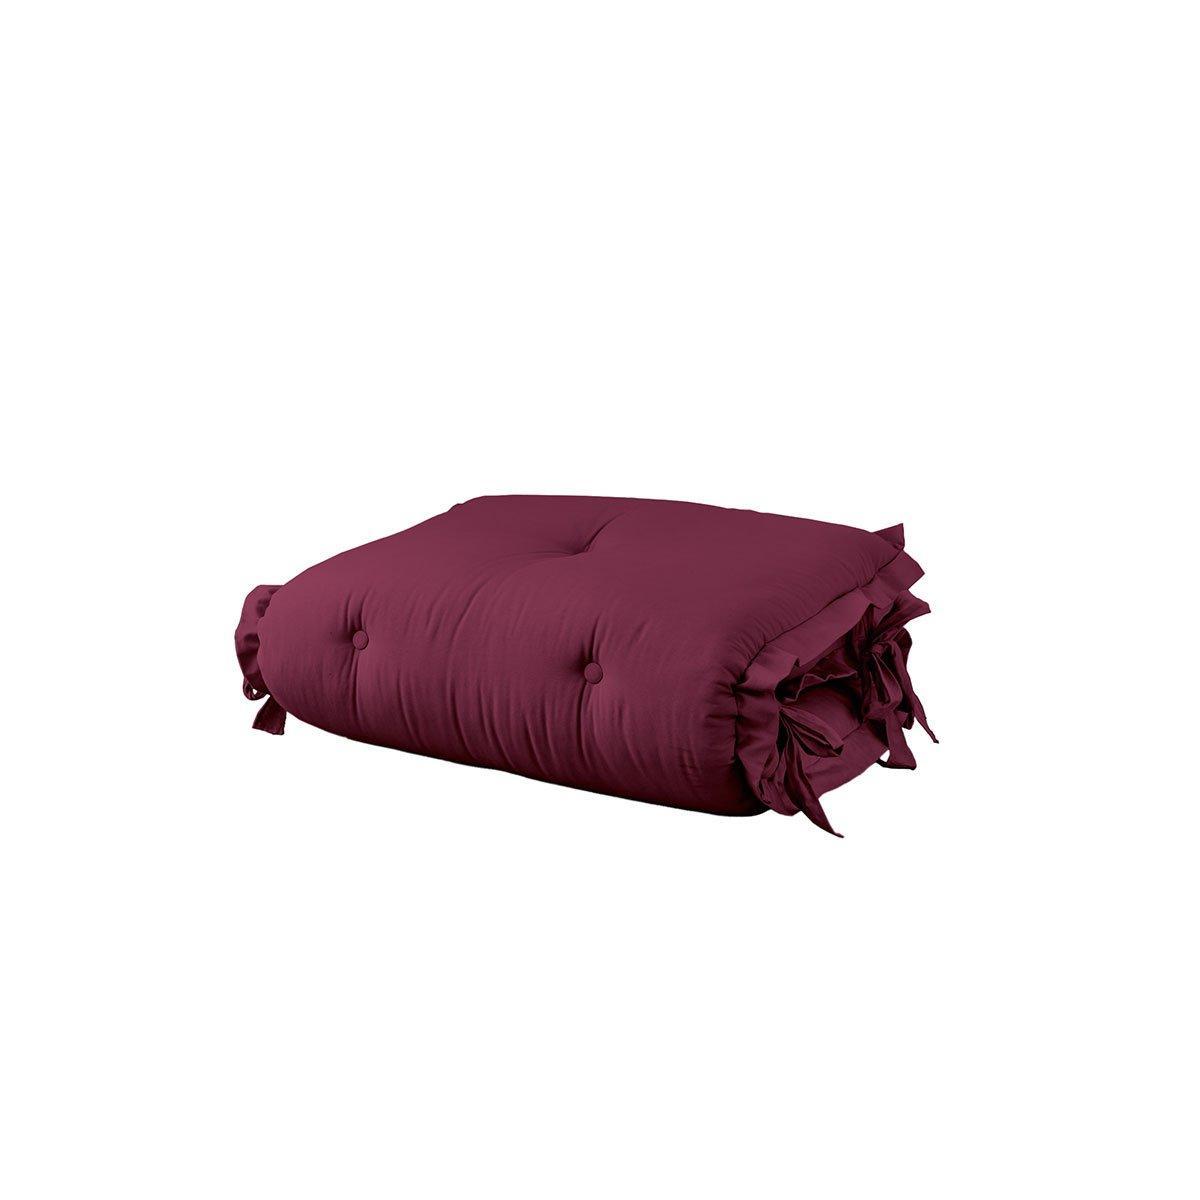 Variabilný matrac Sit And Sleep – Bordeaux